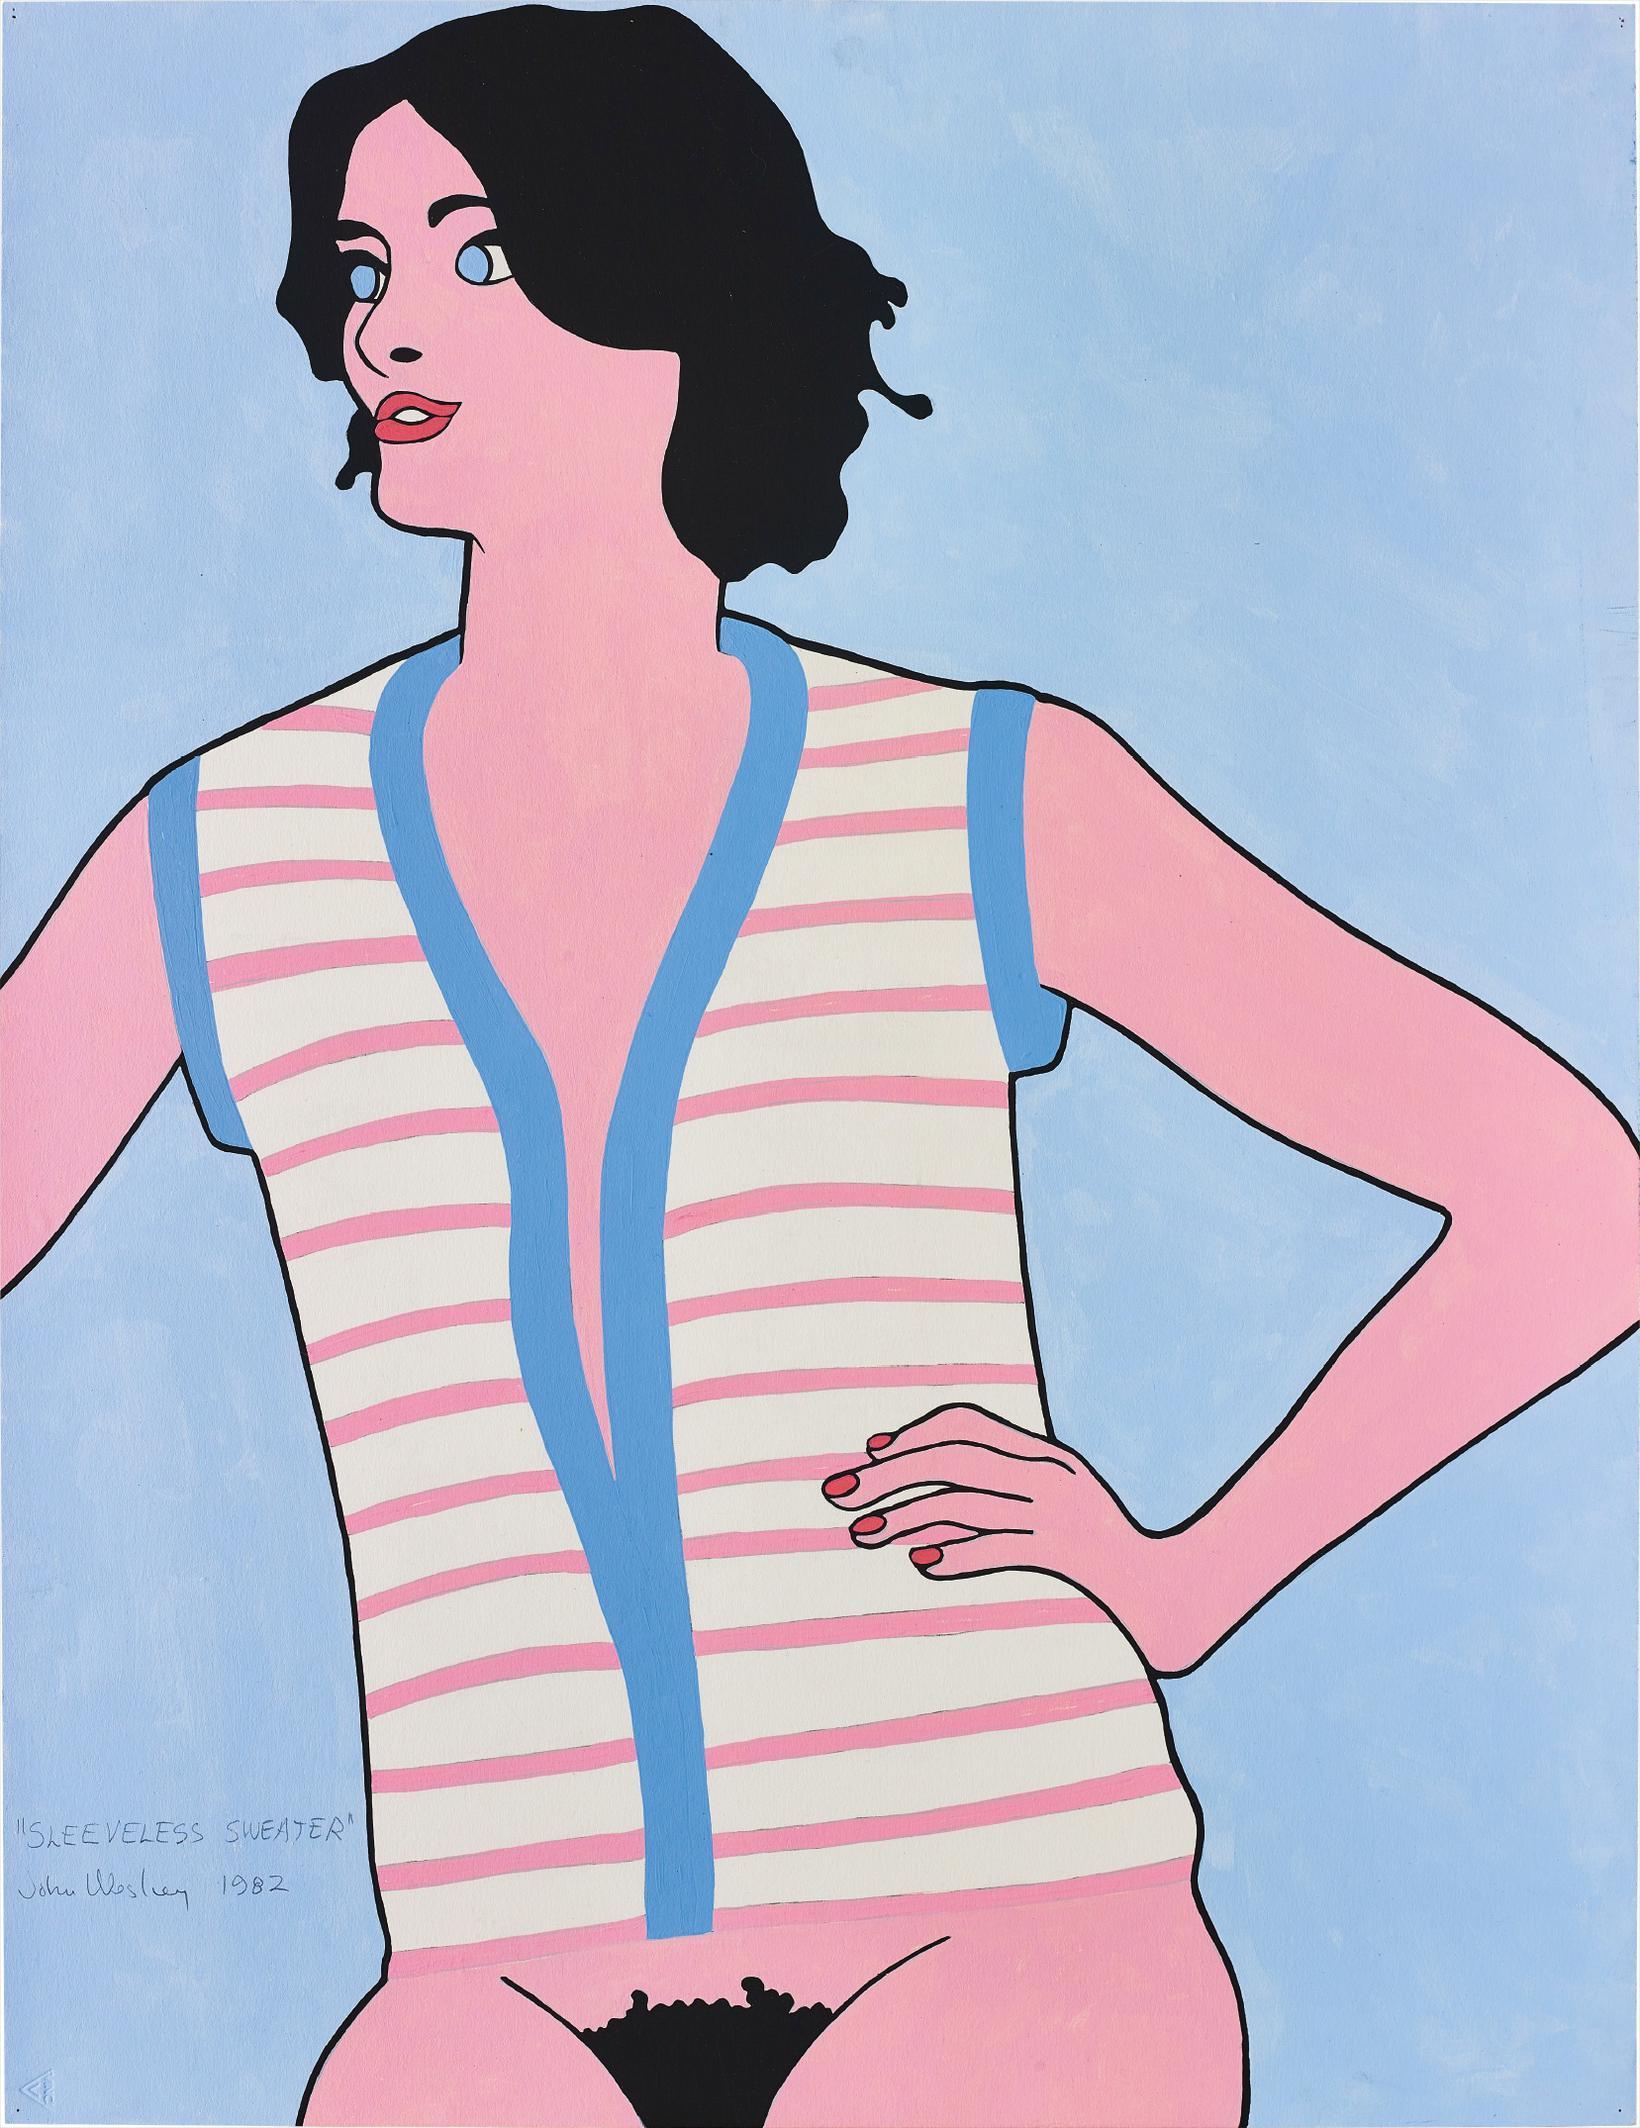 John Wesley-Sleeveless Sweater-1982